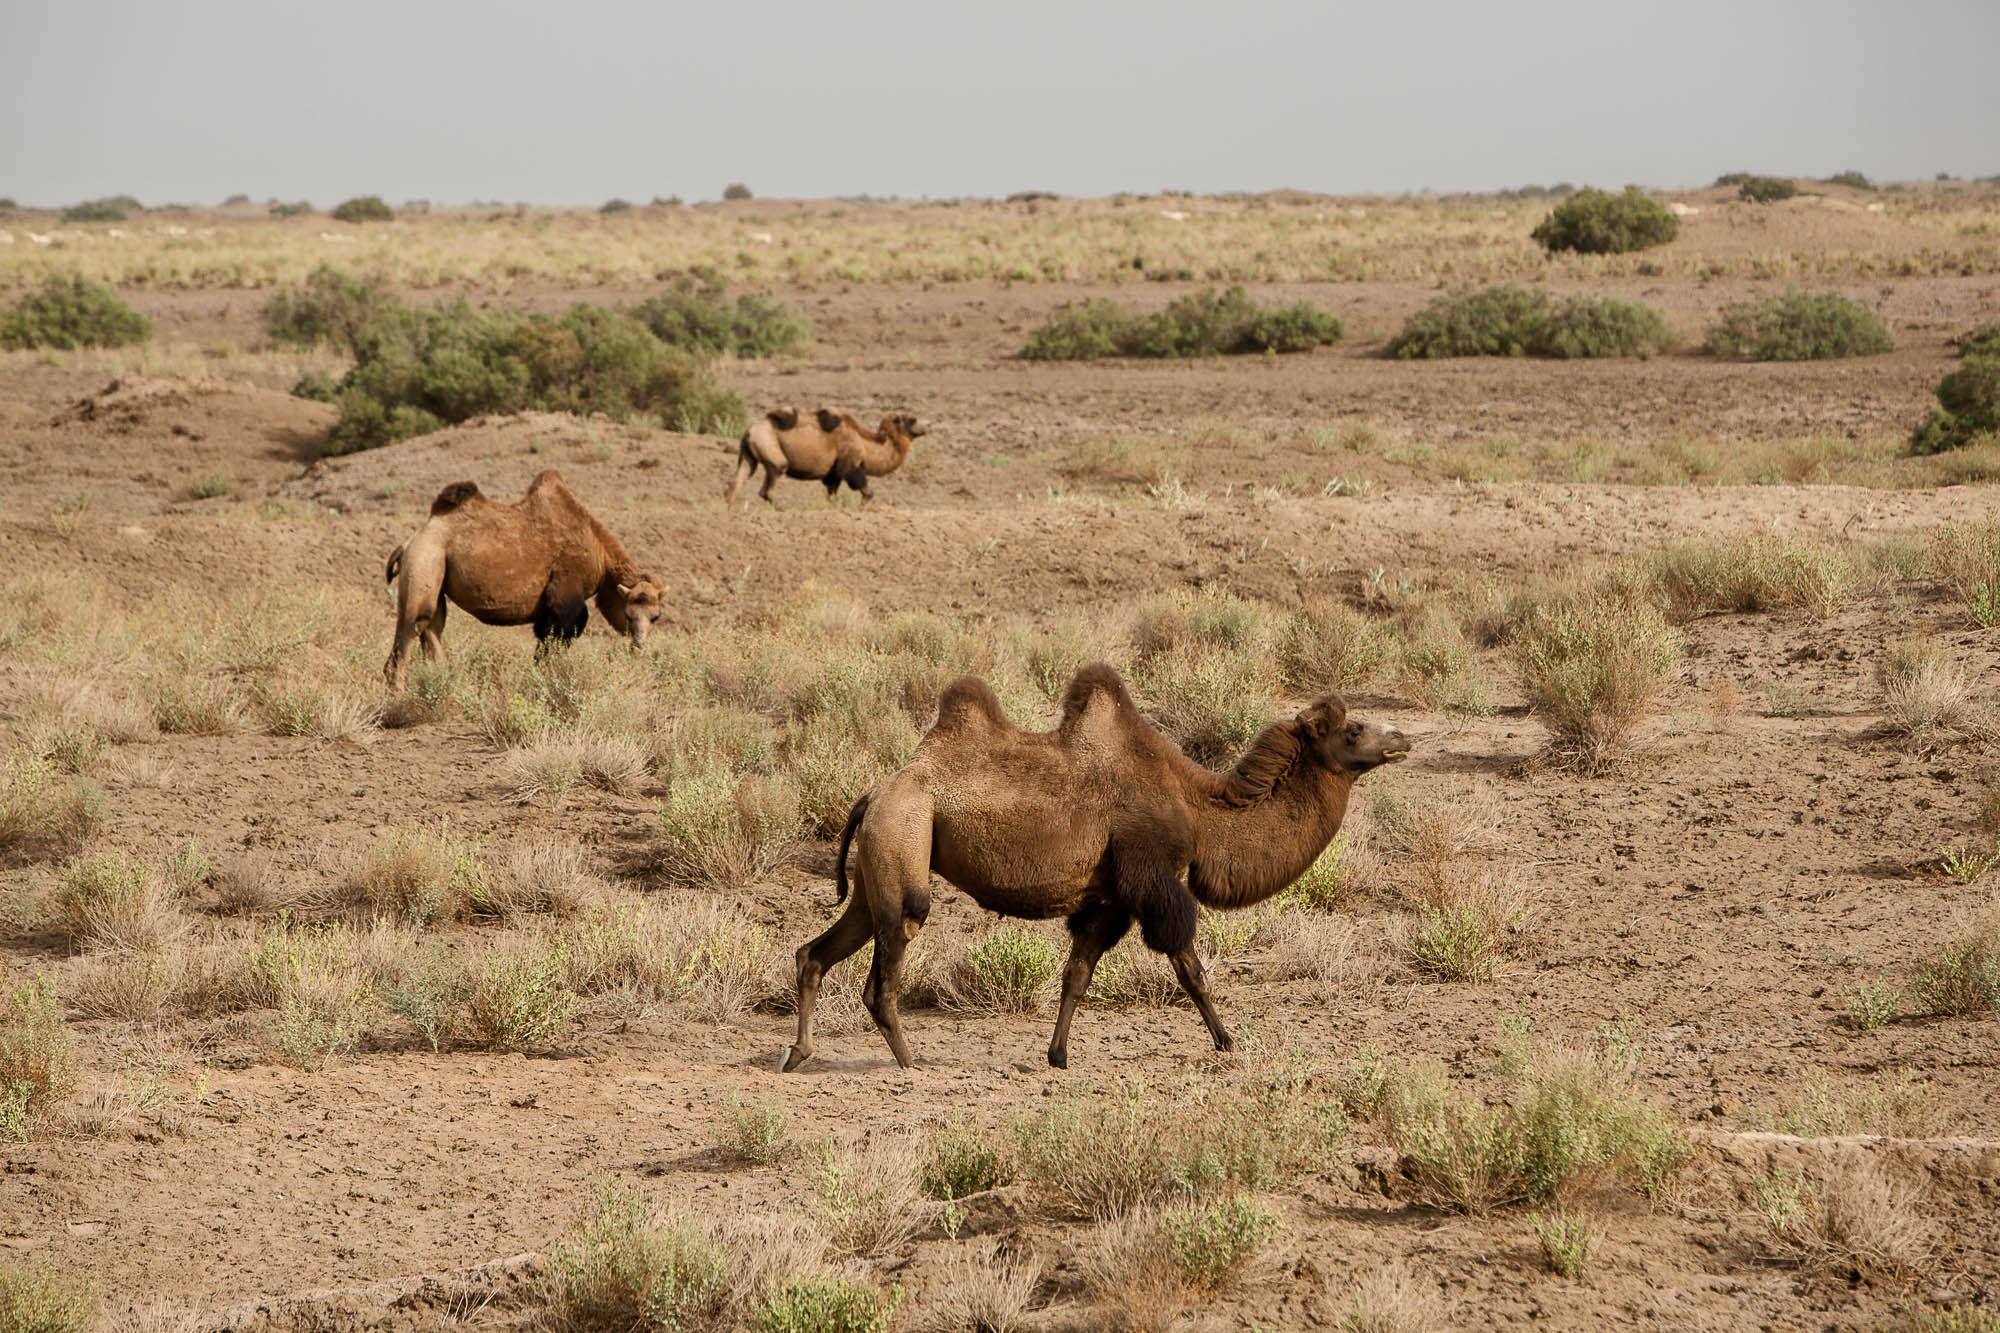 more camels